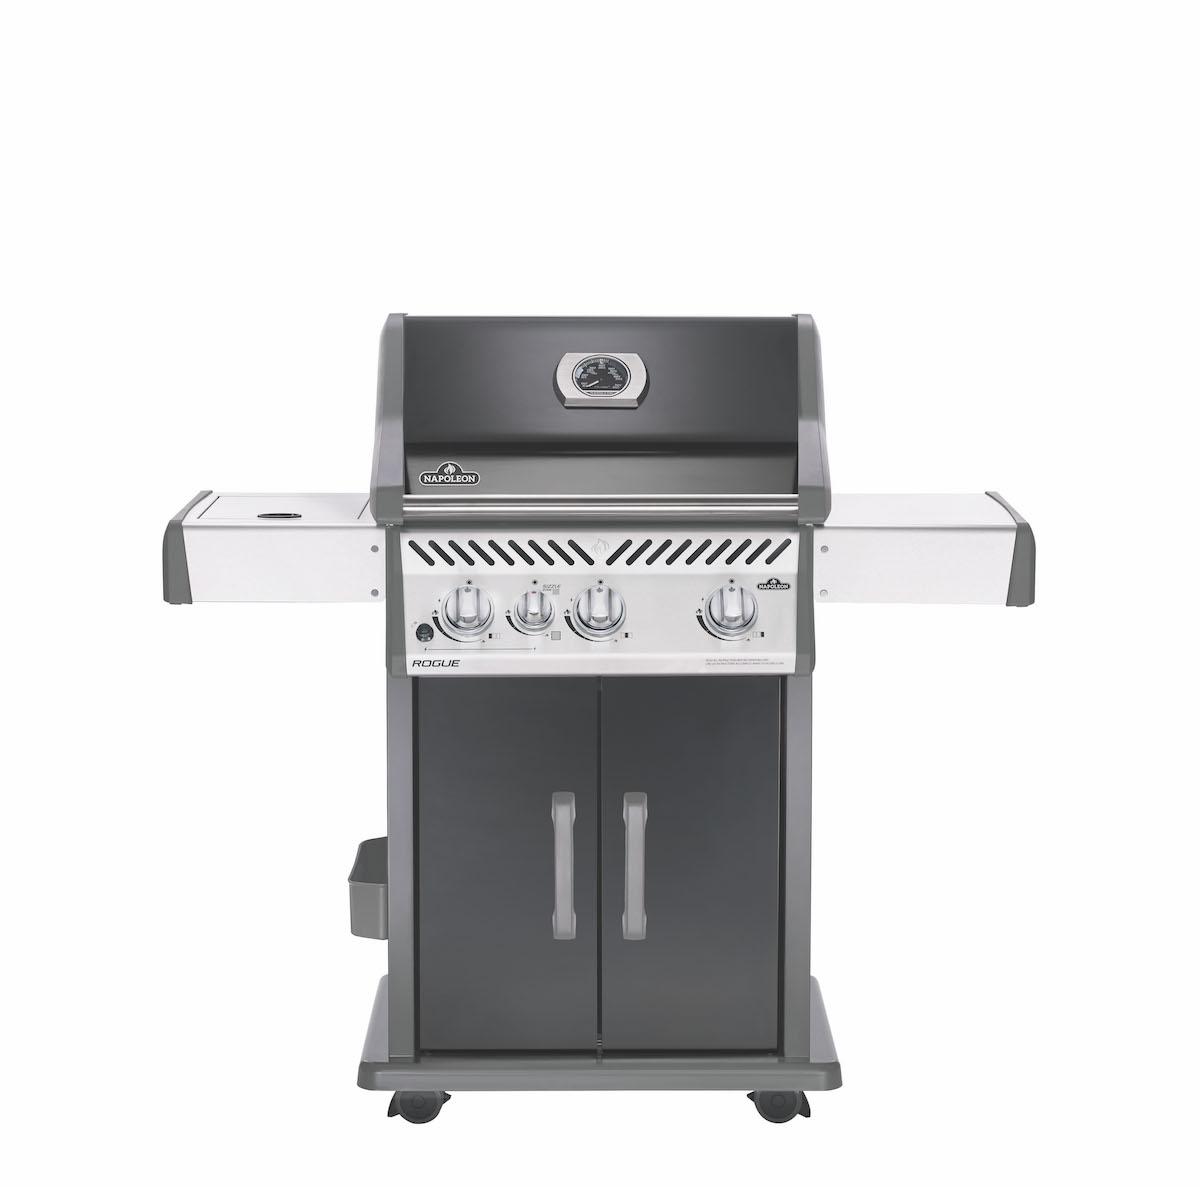 napoleon rogue r425sibk online kaufen grill concept. Black Bedroom Furniture Sets. Home Design Ideas